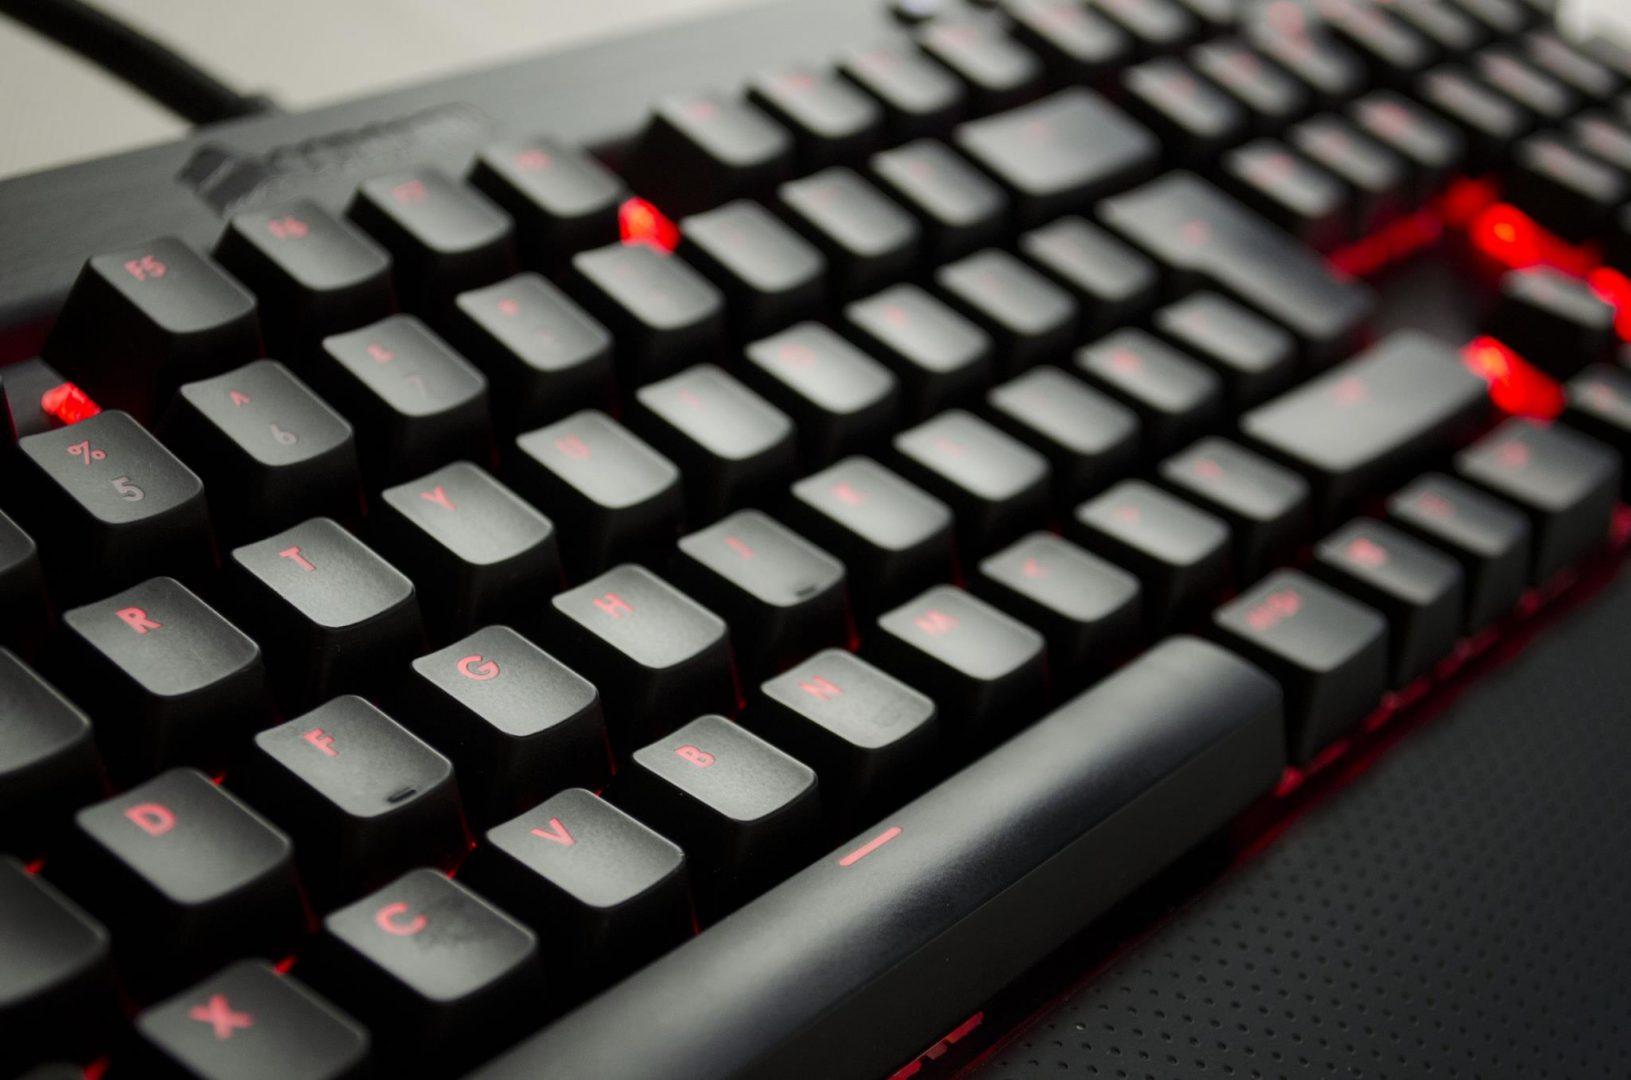 Corsair K70 RGB Mechanical Keyboard_6